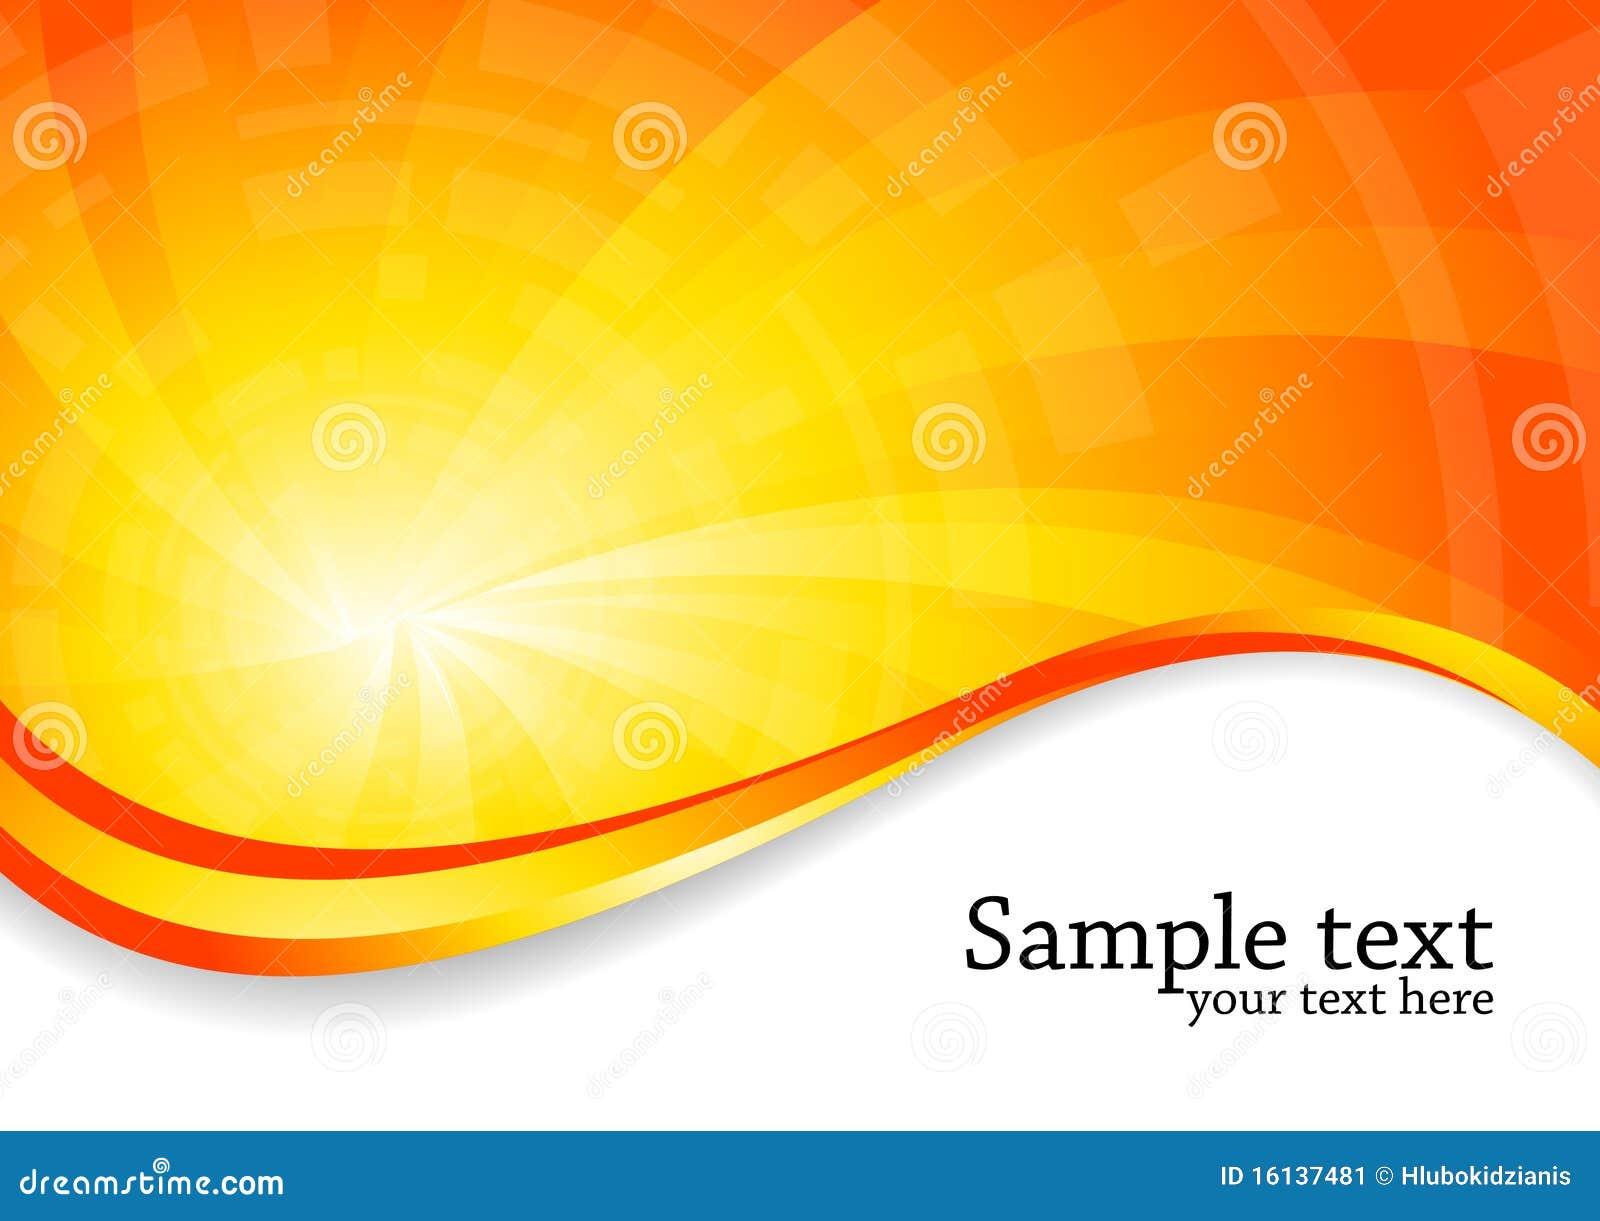 bright background in orange color stock image